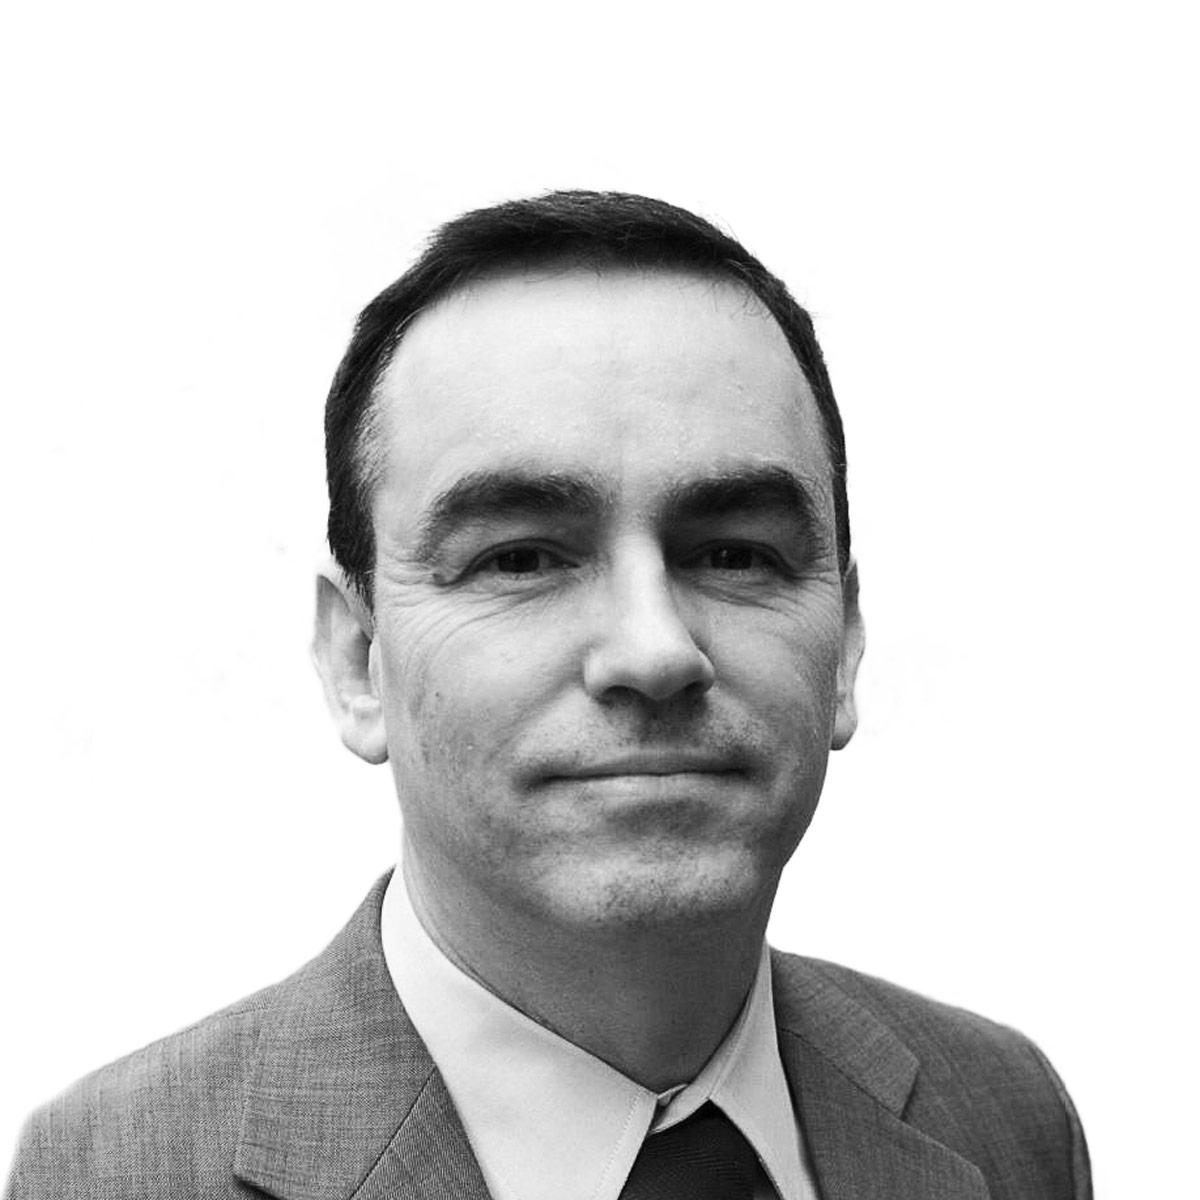 Eddy Travia CONSILIUM GROUP CEO and Cofounder